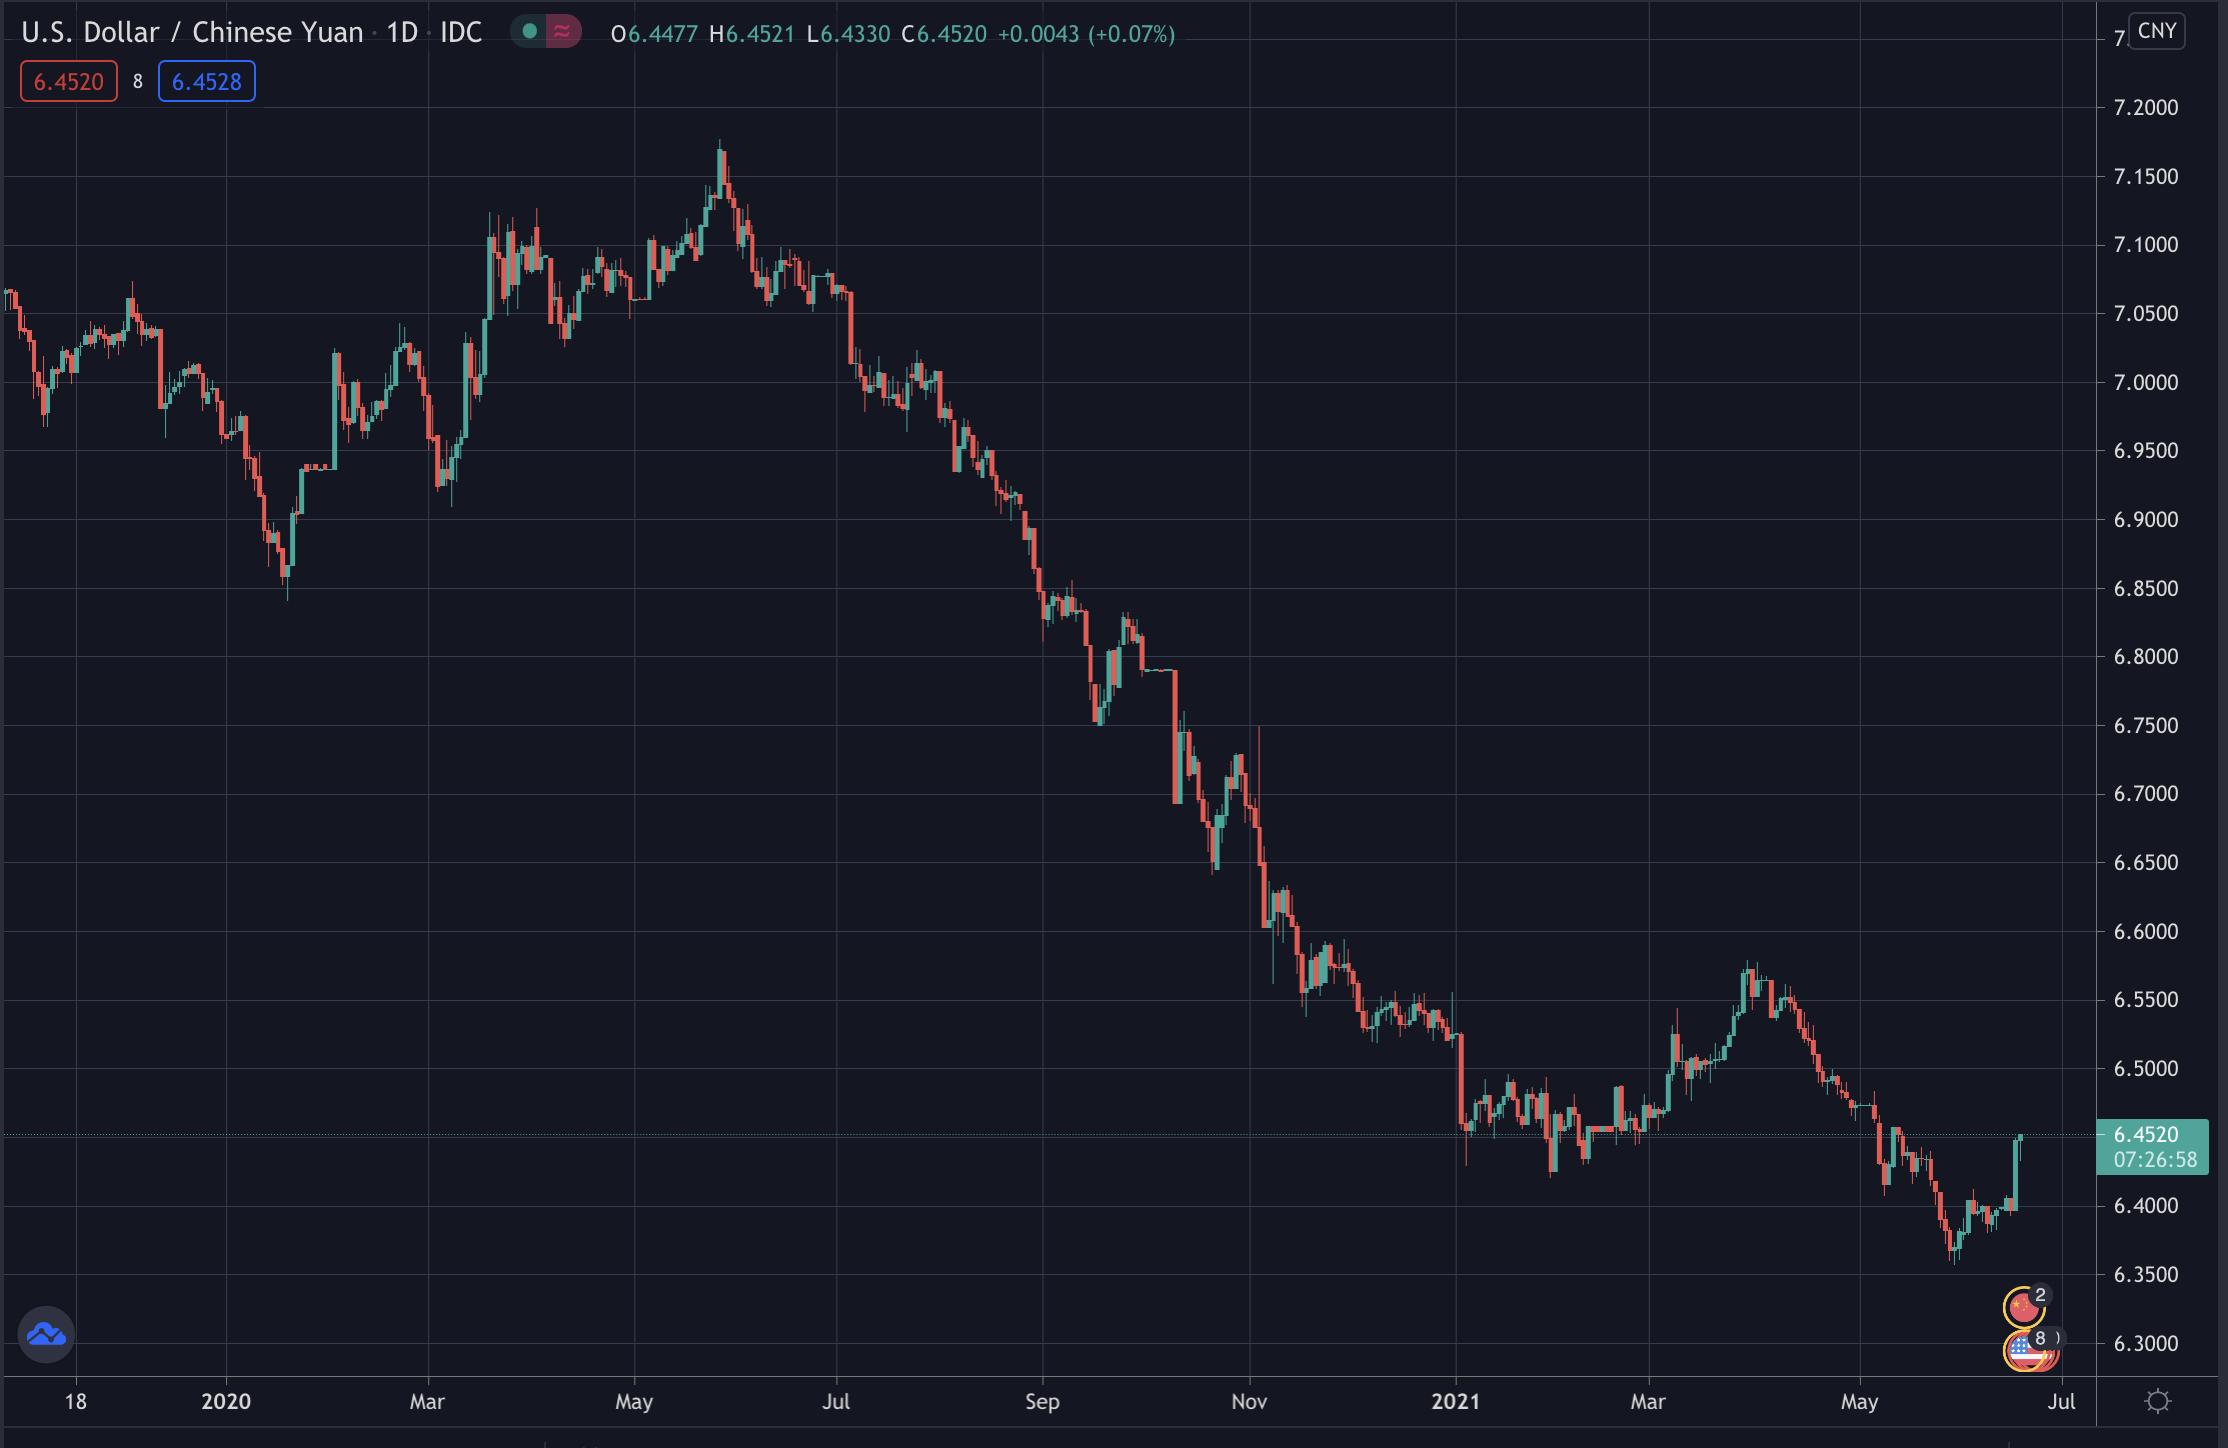 USD/CNY on Tradingview, June 2021